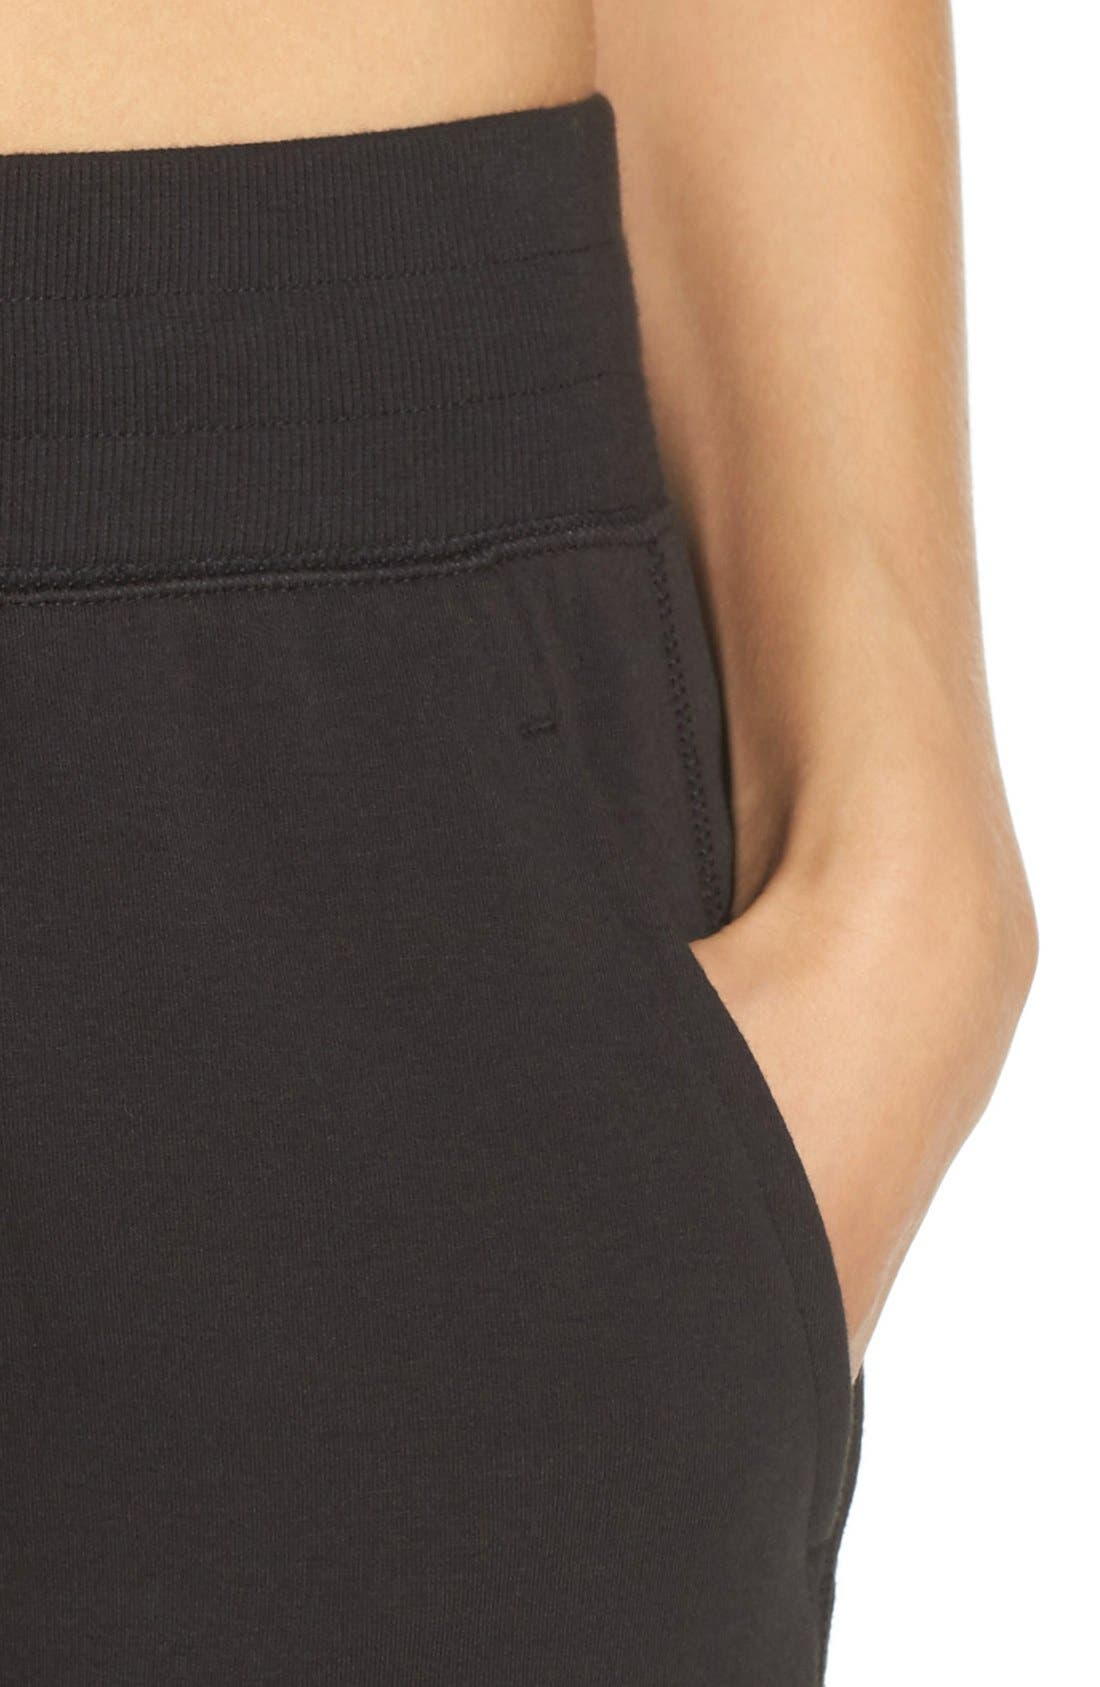 Luxe Lounge Sweatpants,                             Alternate thumbnail 4, color,                             001